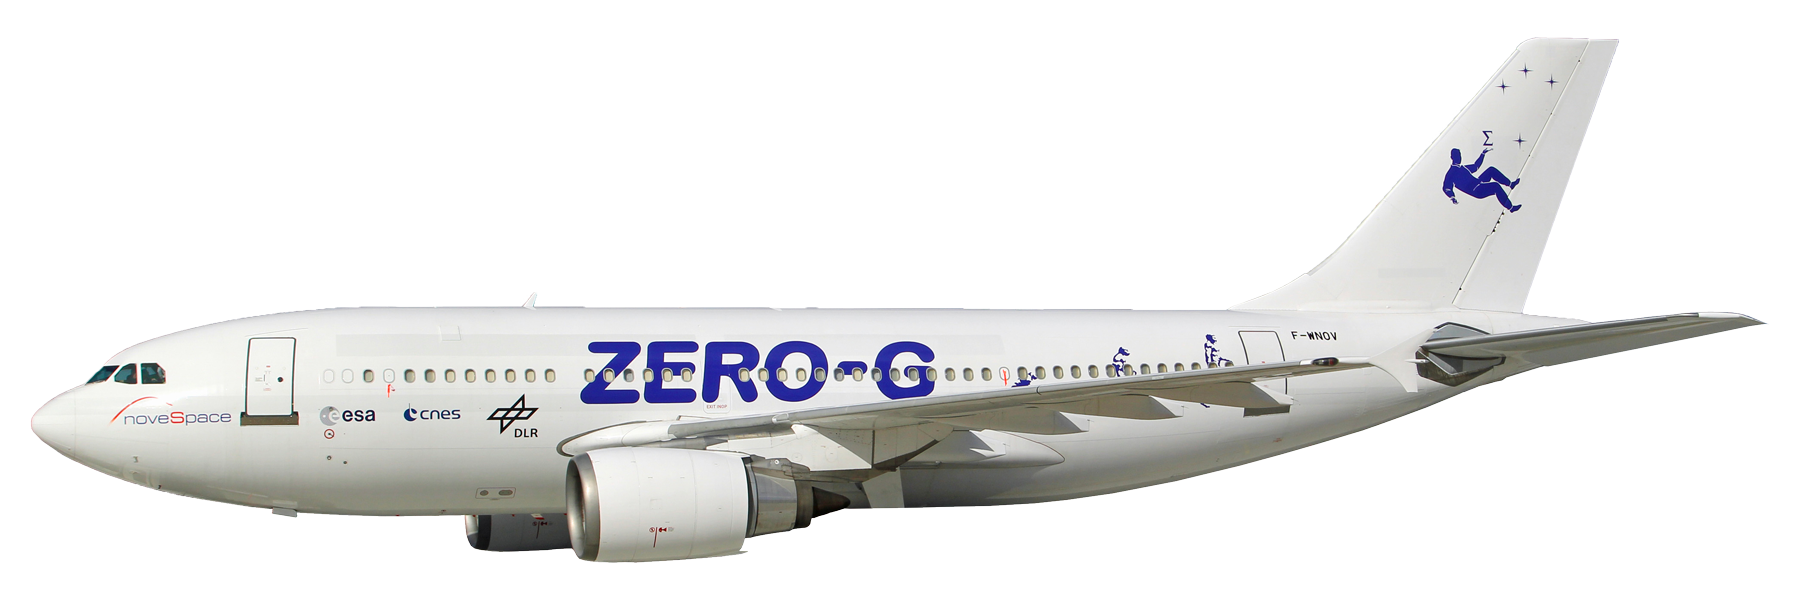 airbus-a310-zerog